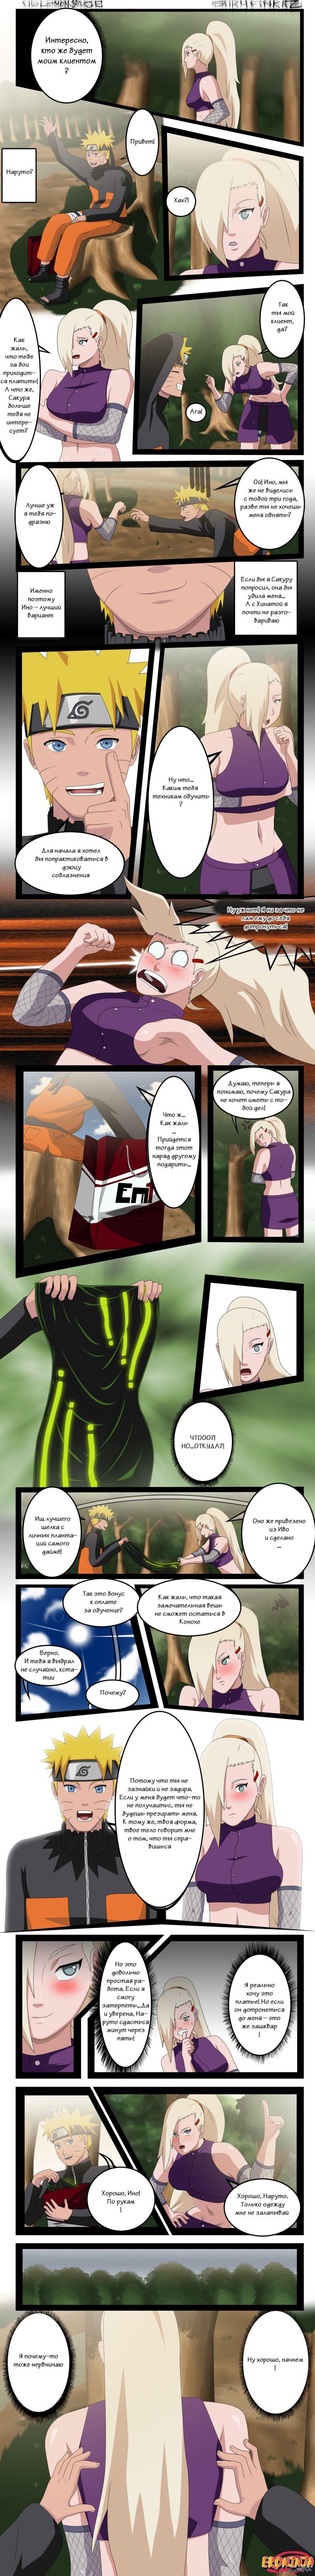 Порно Комикс Эро Ниндзя Naruto Eroninja